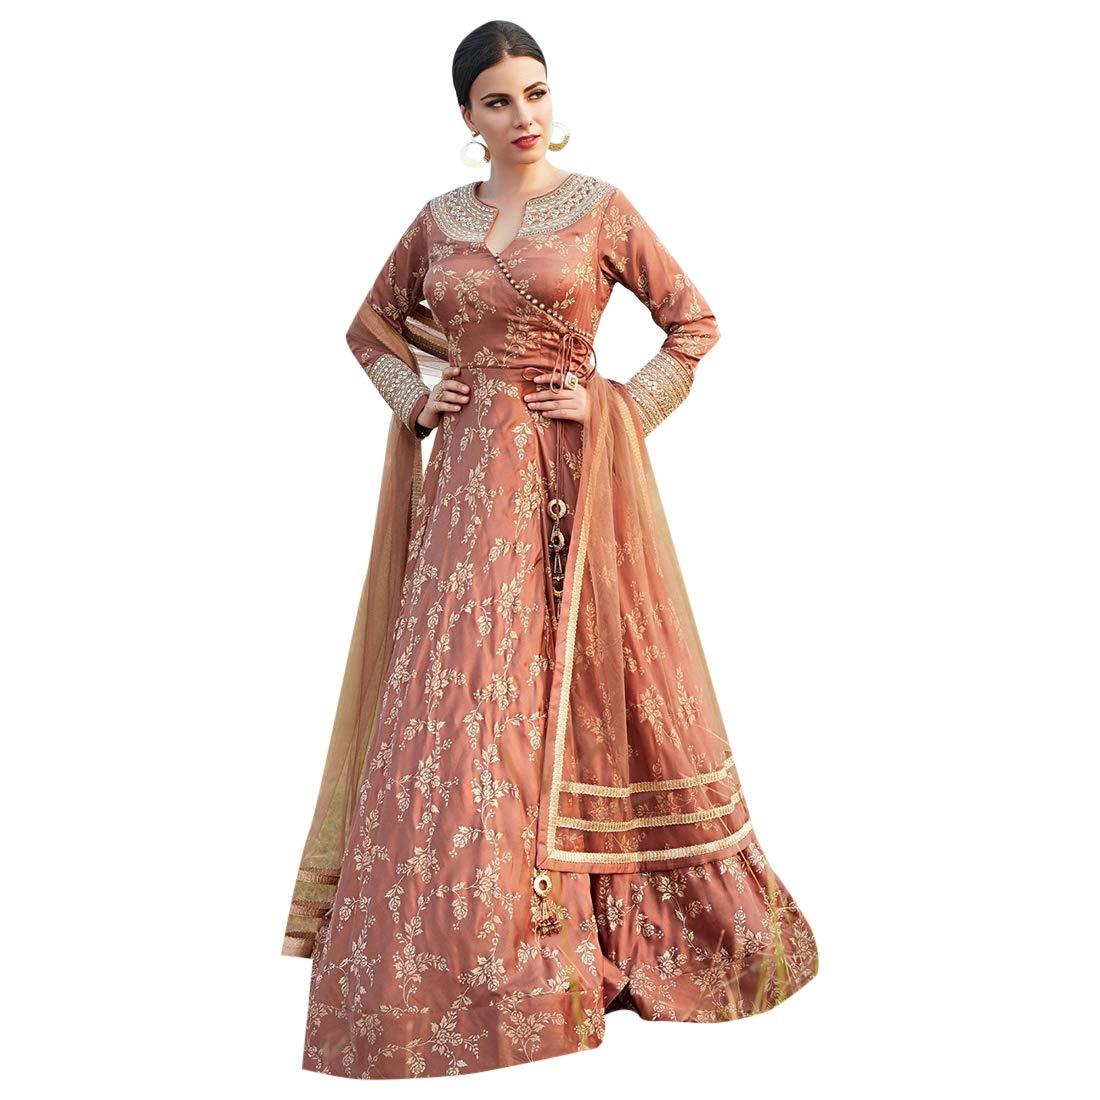 Indian Designer Collection Heavy Anarkali Salwar Kameez Suit With Soft Net Dupatta Stylish Women Muslim Party Wear 7273